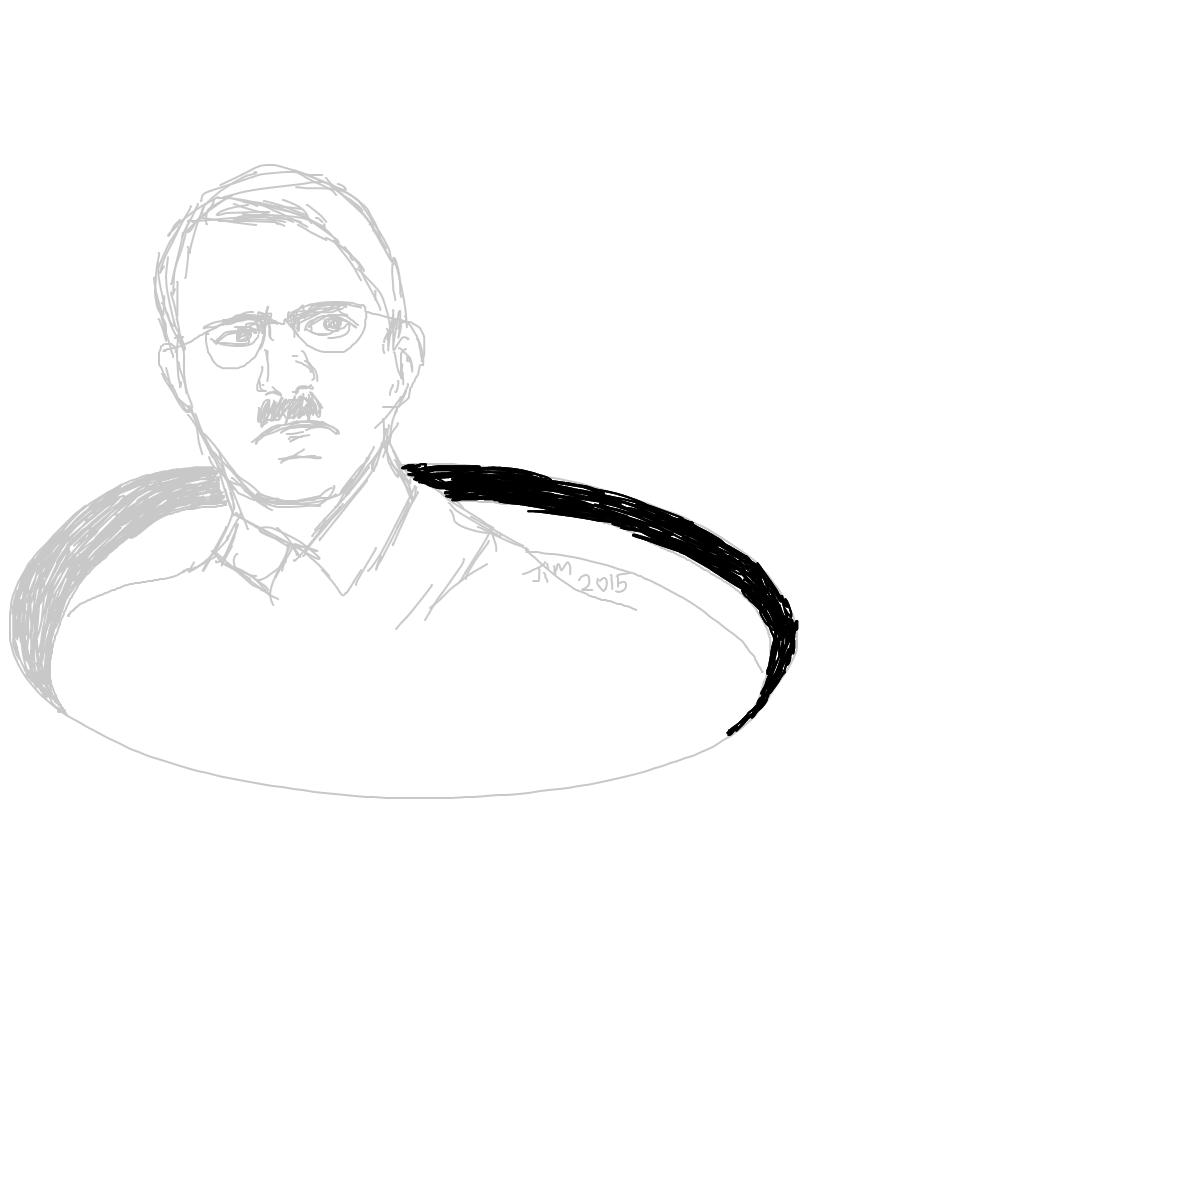 BAAAM drawing#9390 lat:52.4752349853515600lng: 13.4070720672607420